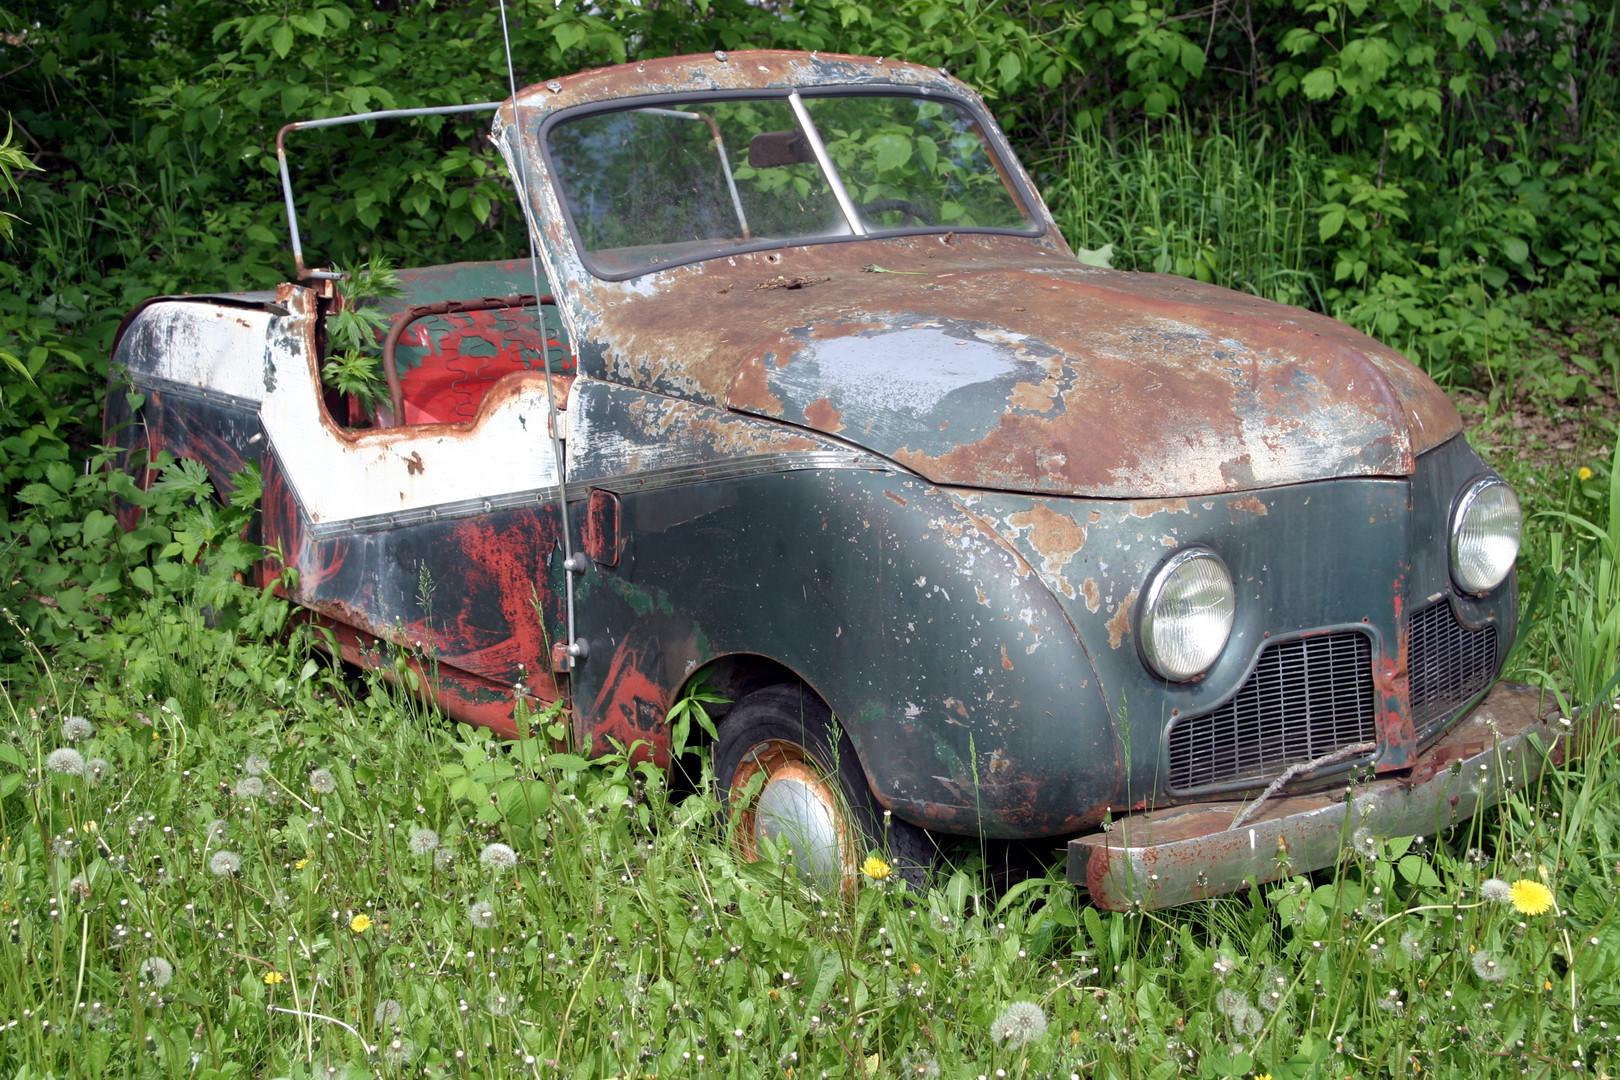 Old blue car in junk yard 08.jpg